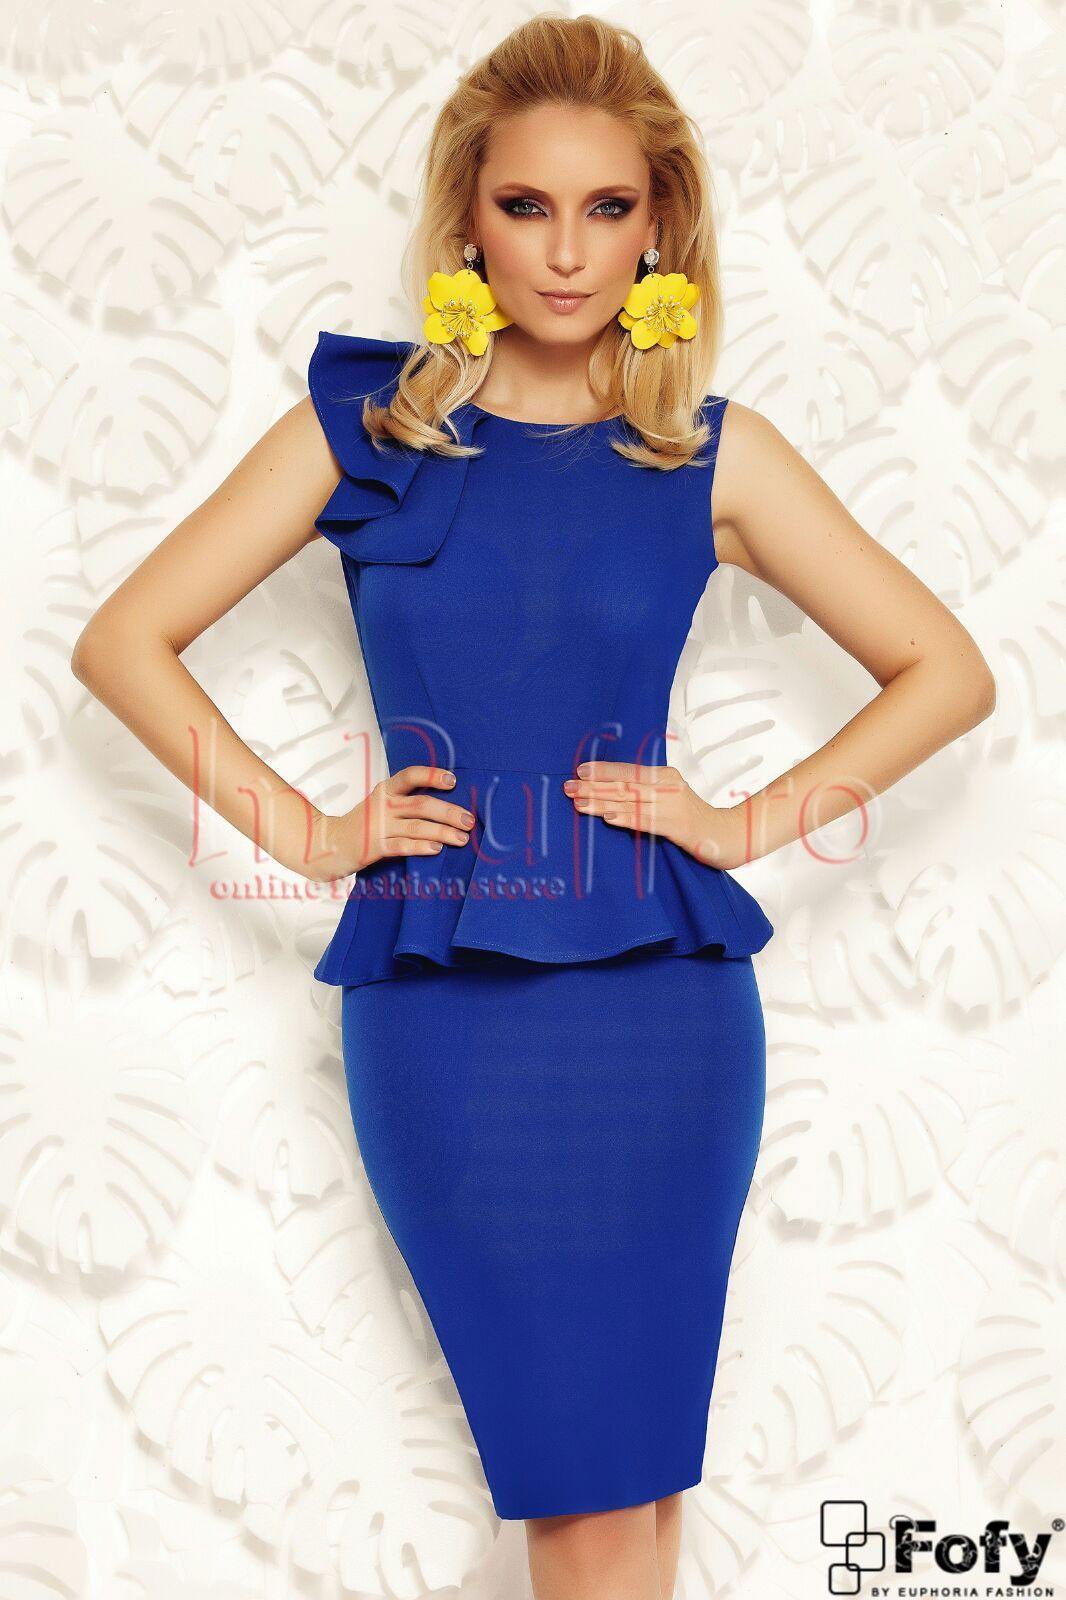 98002f39d21c Rochie Fofy albastra eleganta cu volan in talie si pe umar - Rochie  albastra eleganta cu